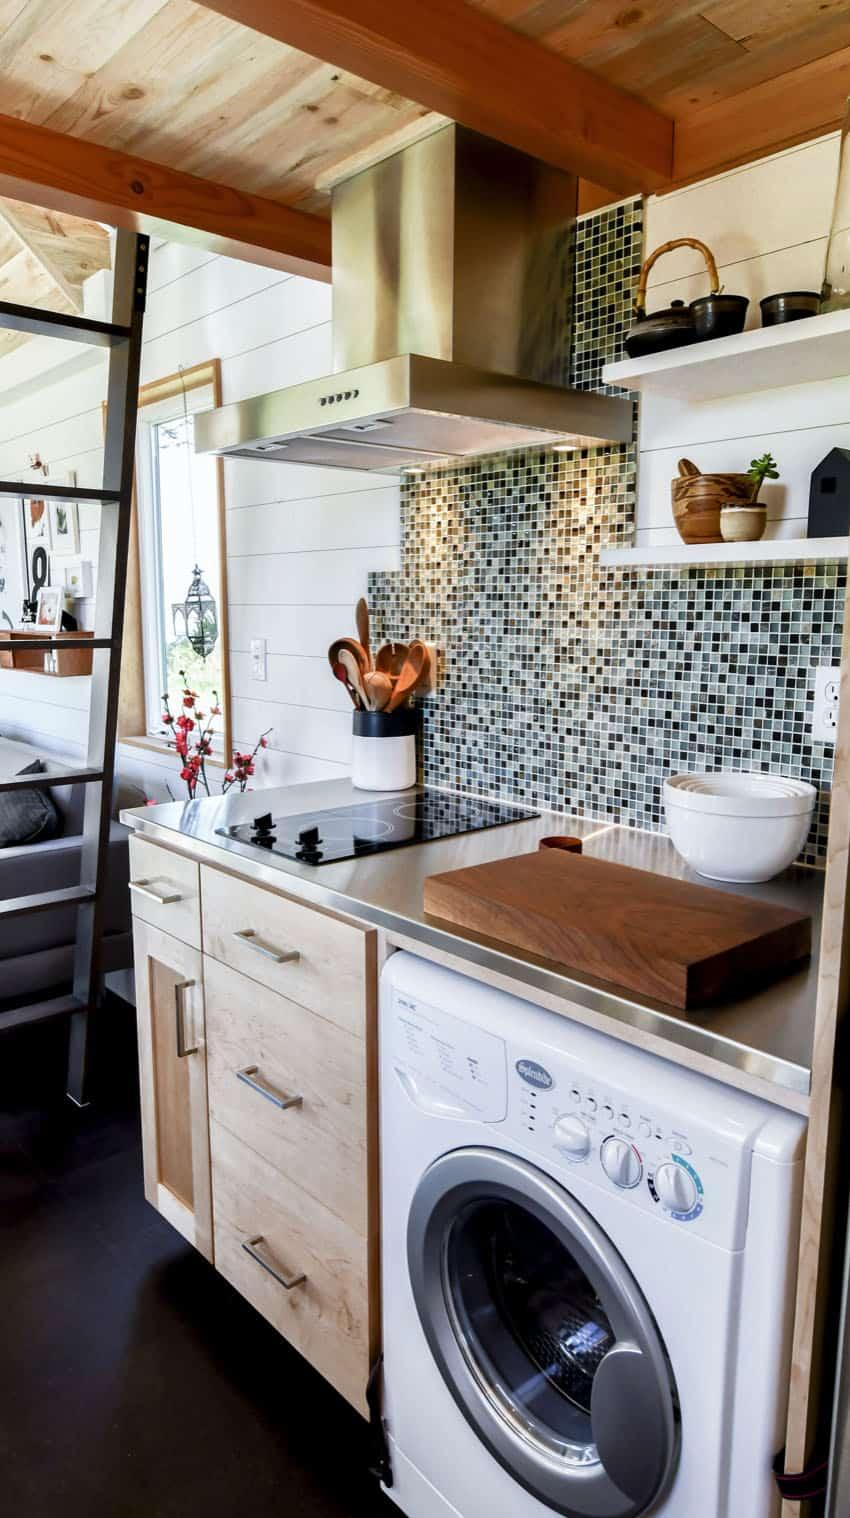 off-grid-tiny-home-farmhouse-kitchen